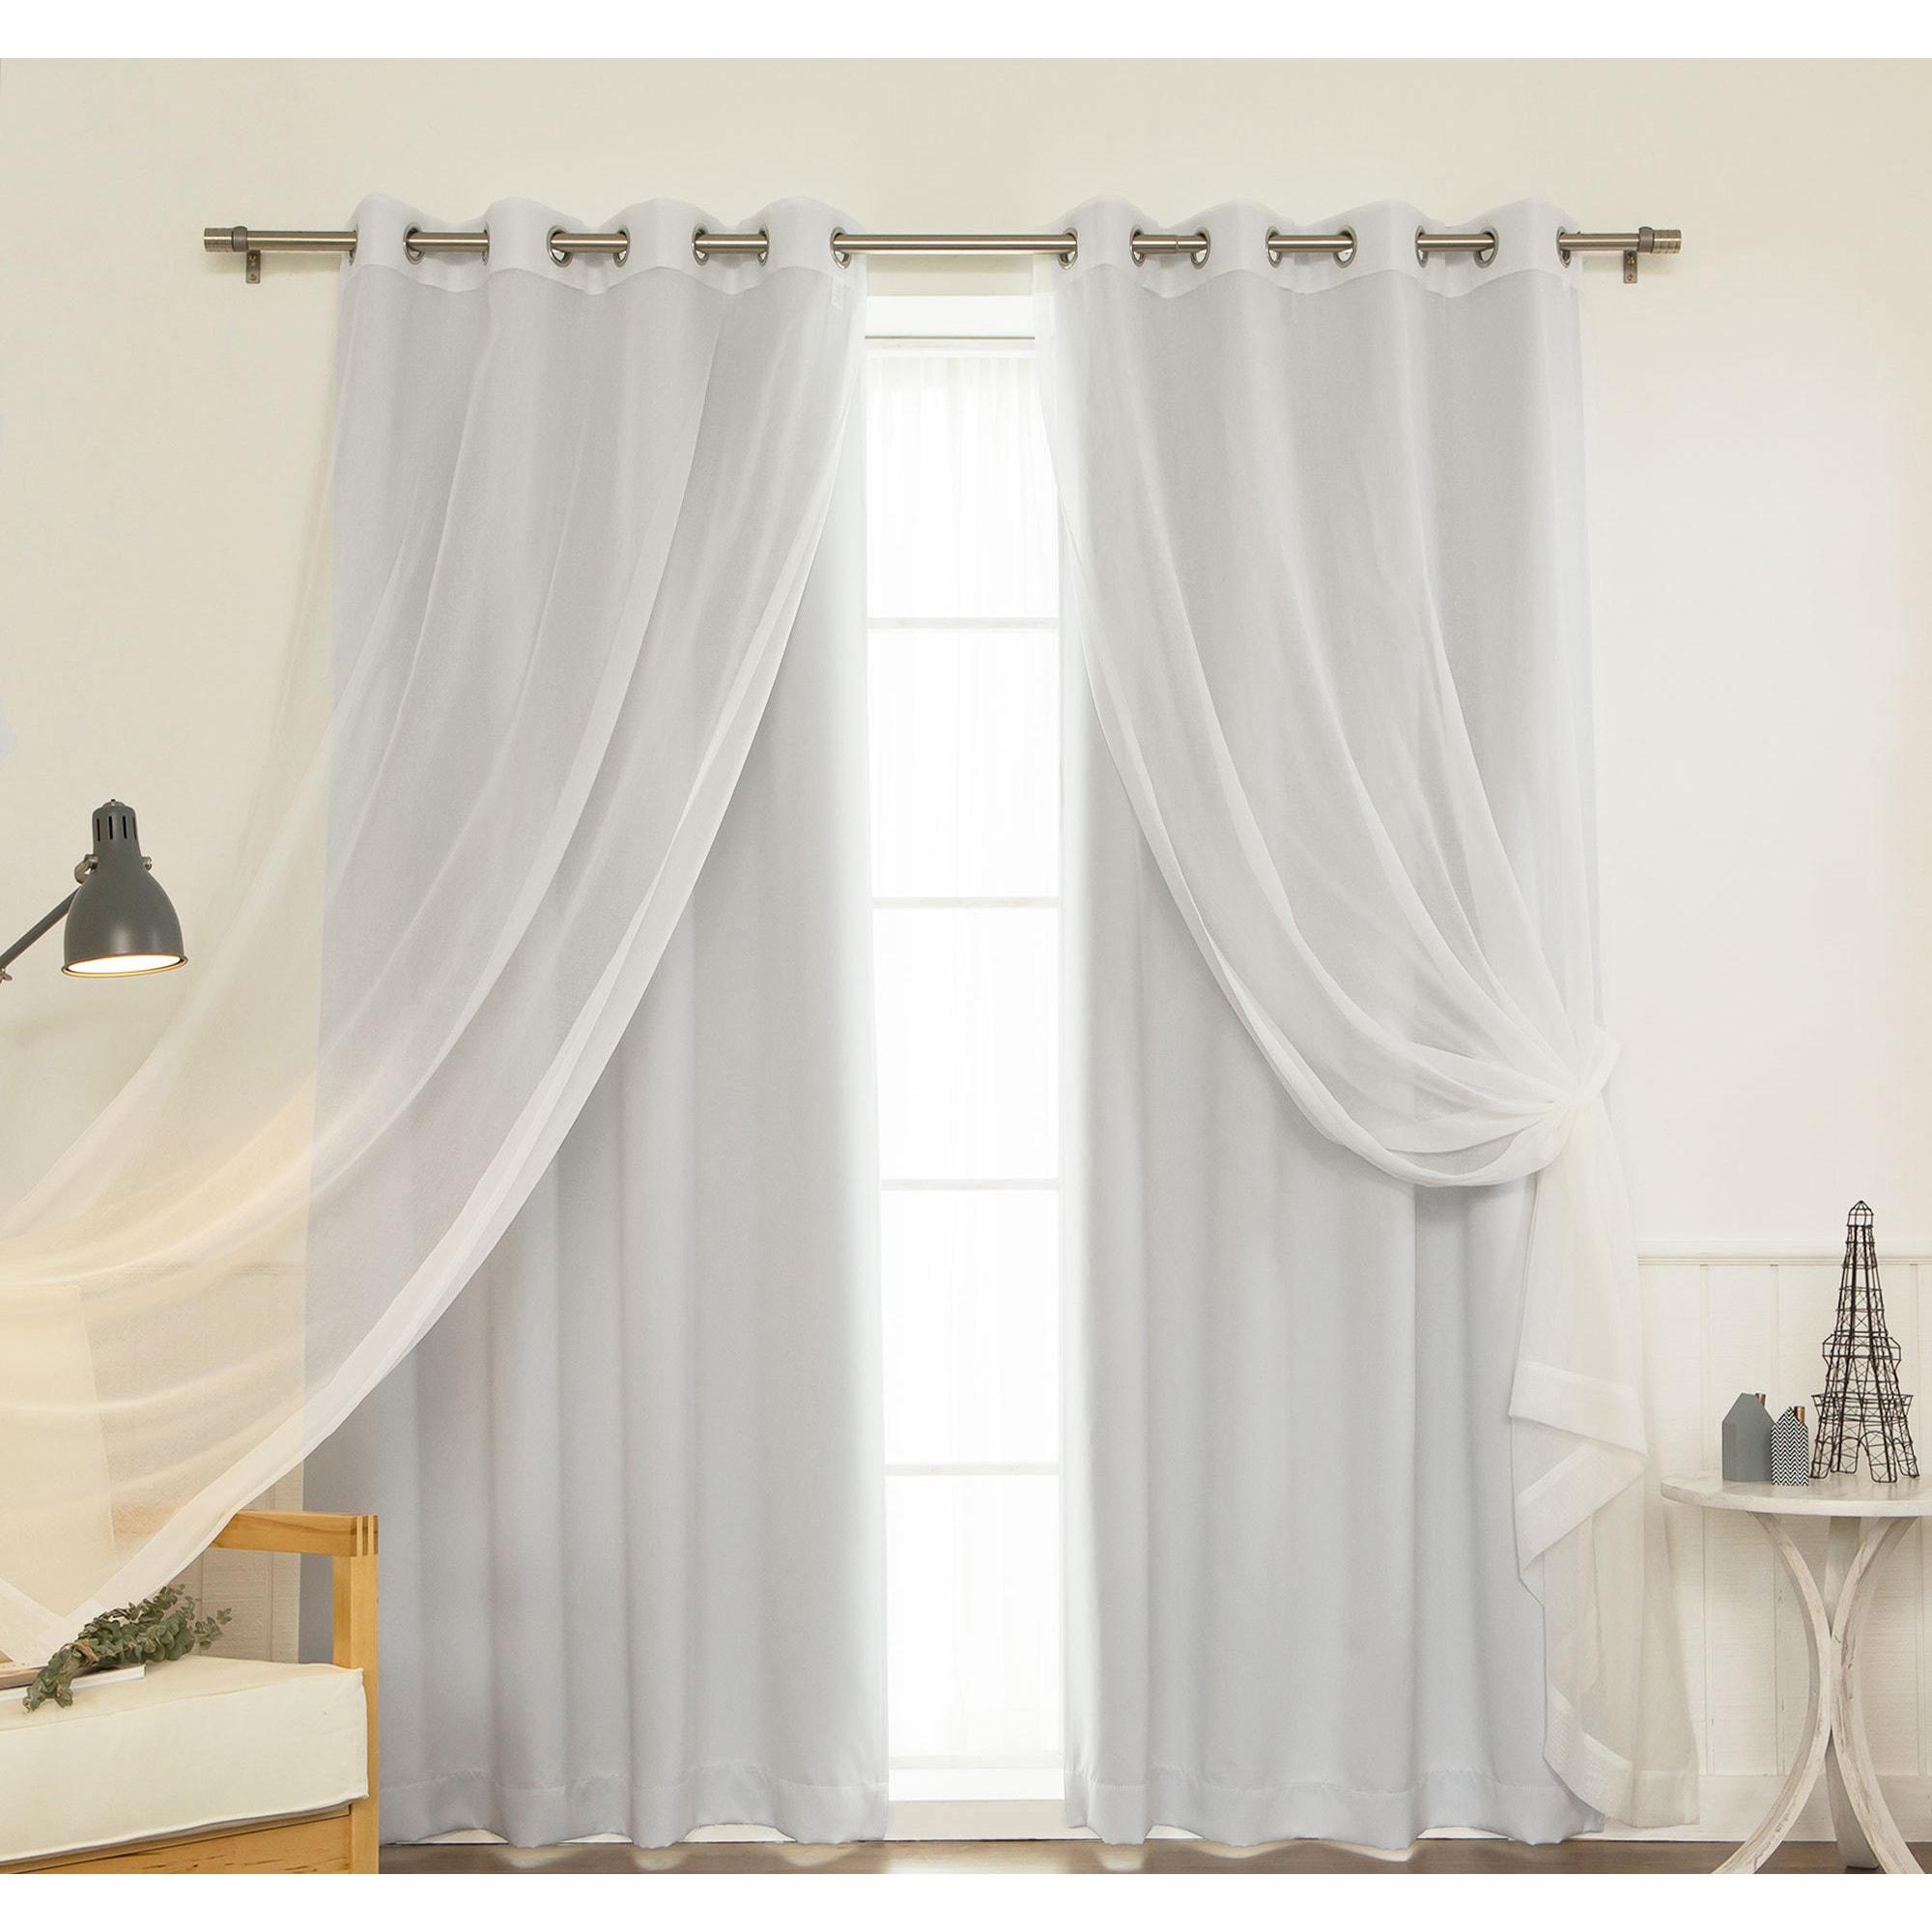 curtains m hd noir design outdoor of x suspension light cm naturel attachment bamboo h